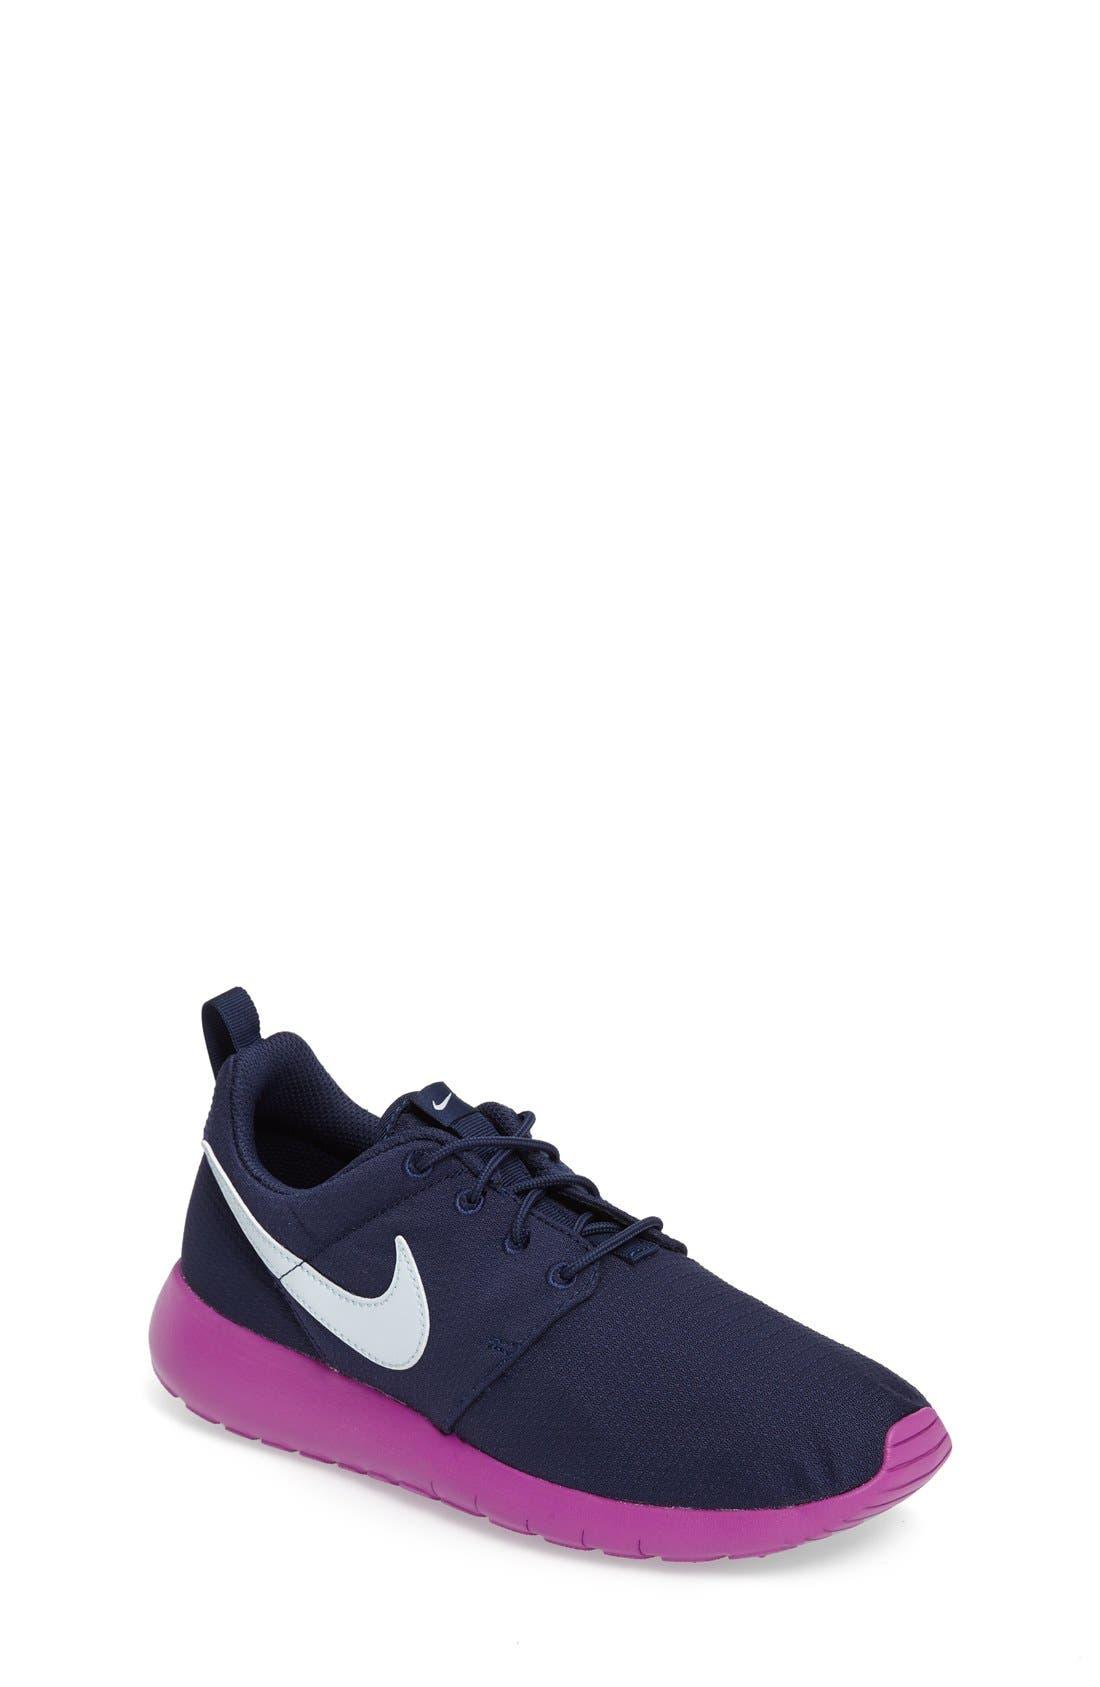 'Roshe Run' Athletic Shoe,                             Main thumbnail 35, color,